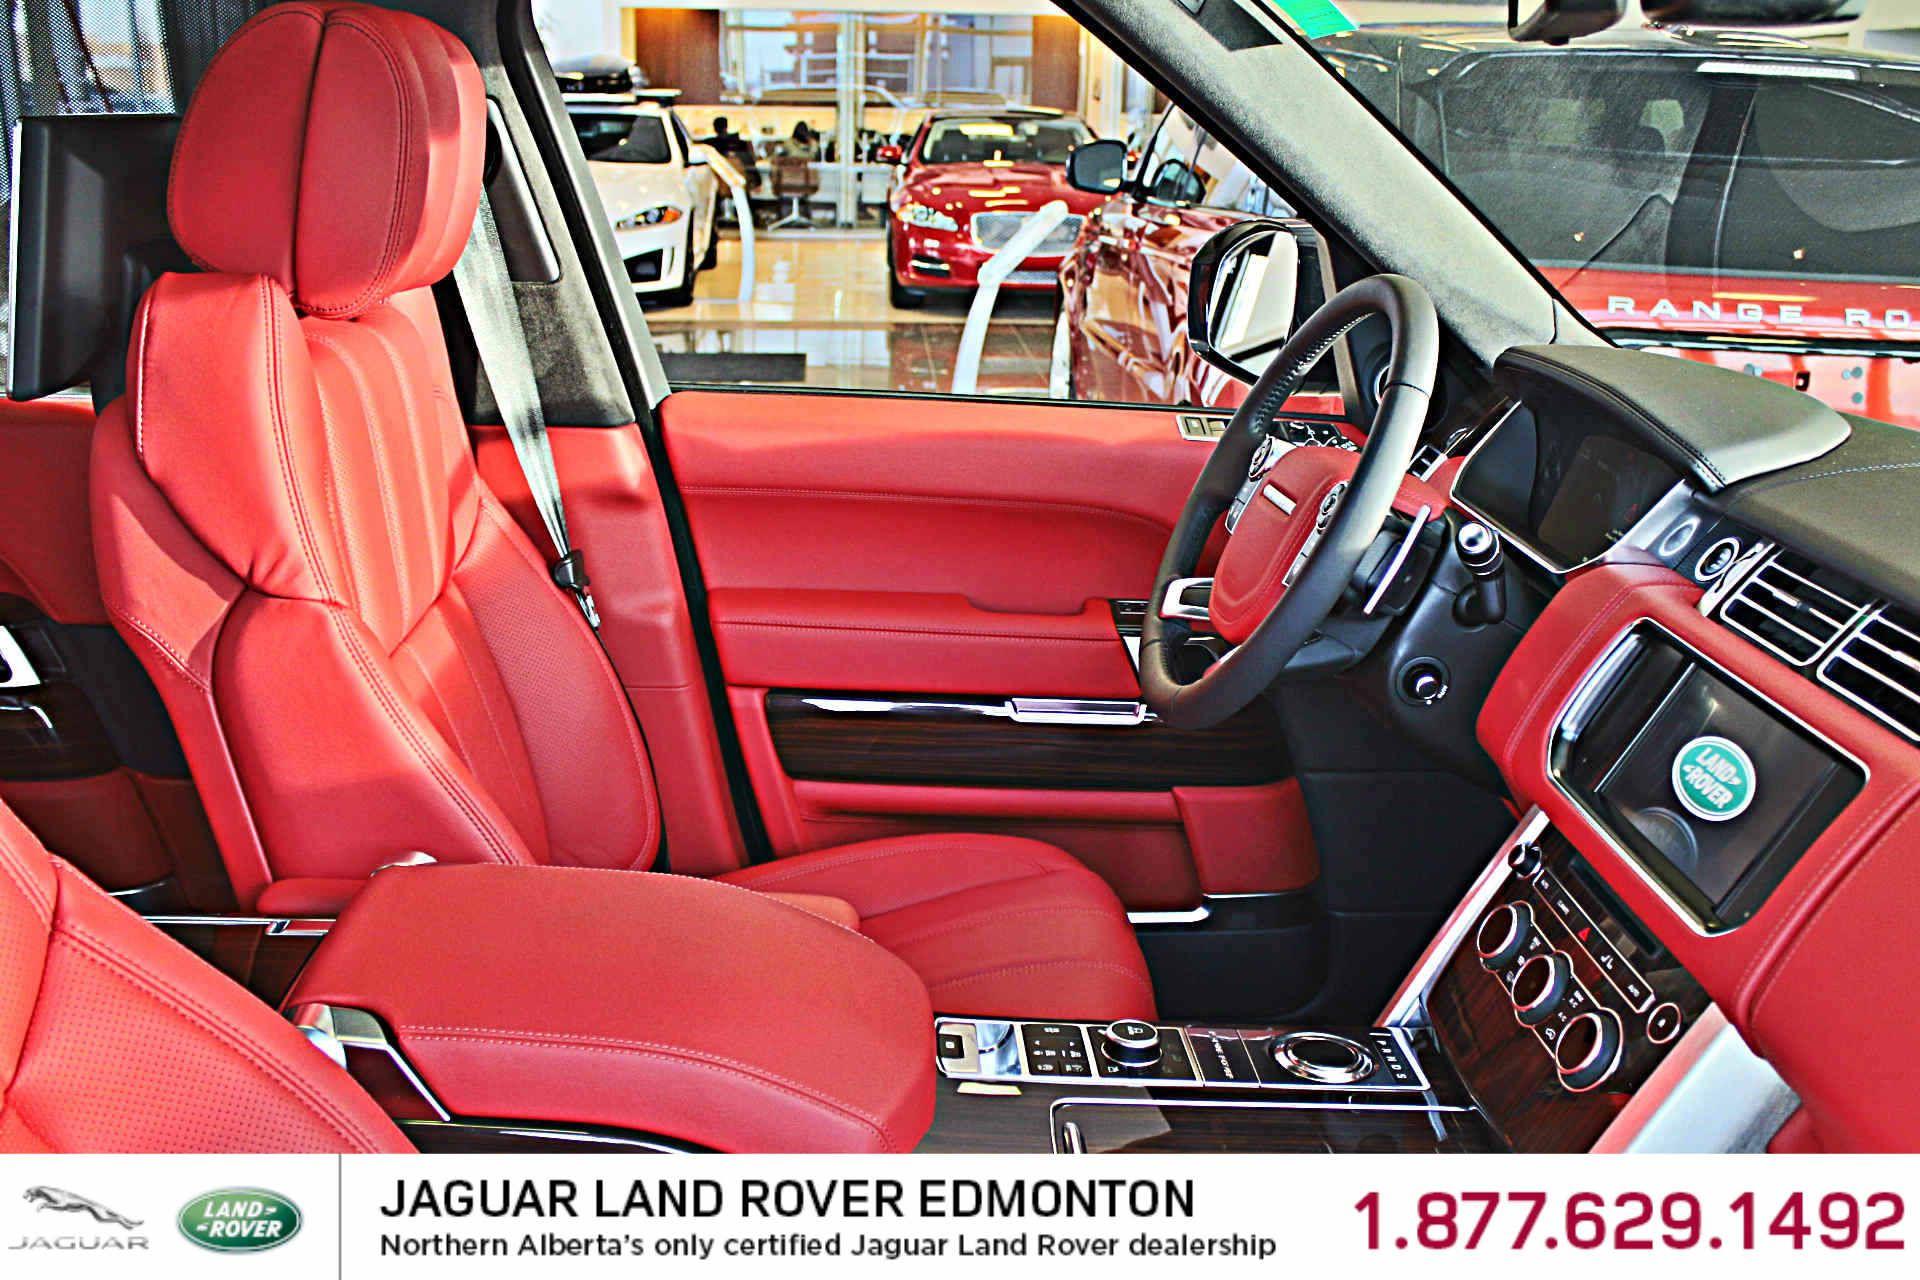 2015 Full Size Range Rover Red Interior Sick Rides Pinterest Red Interiors Range Rovers